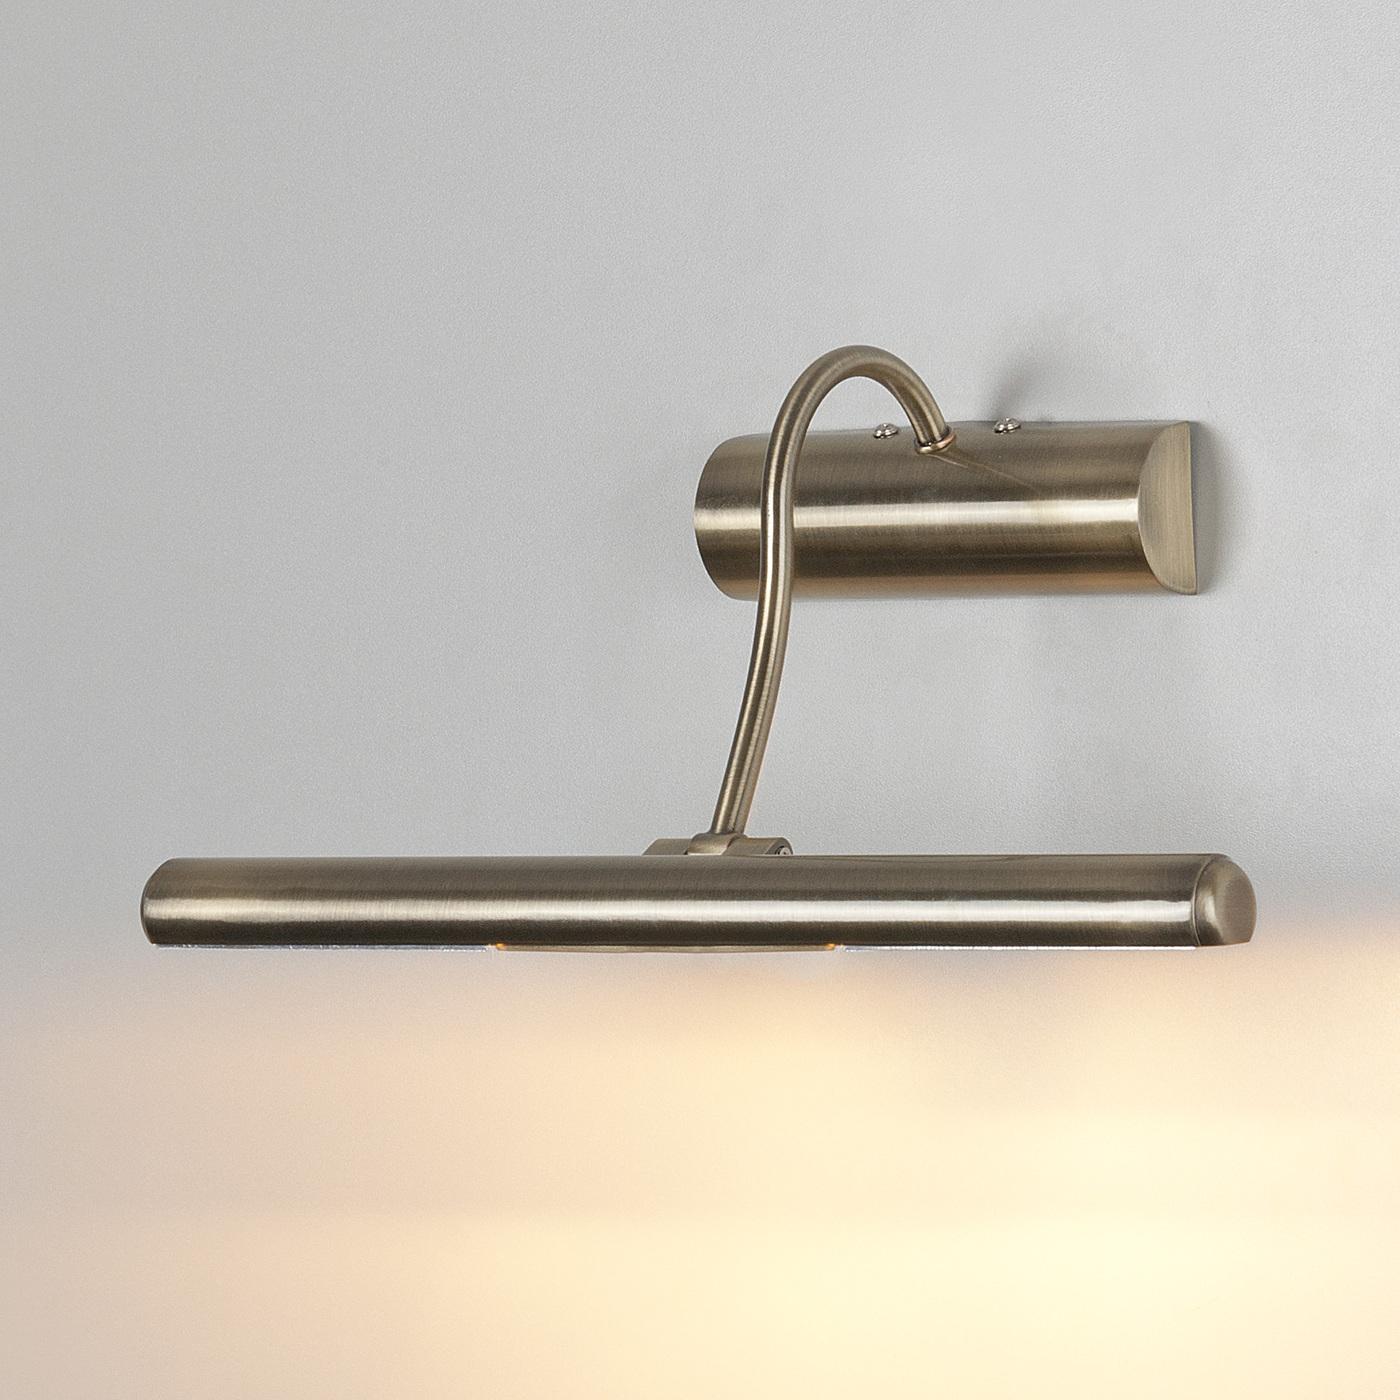 Фото - Настенный светильник Elektrostandard G9 40W 3079, 40 Вт потолочный светильник ideal lux pl6 g9 max 6 x 40w g9 вт